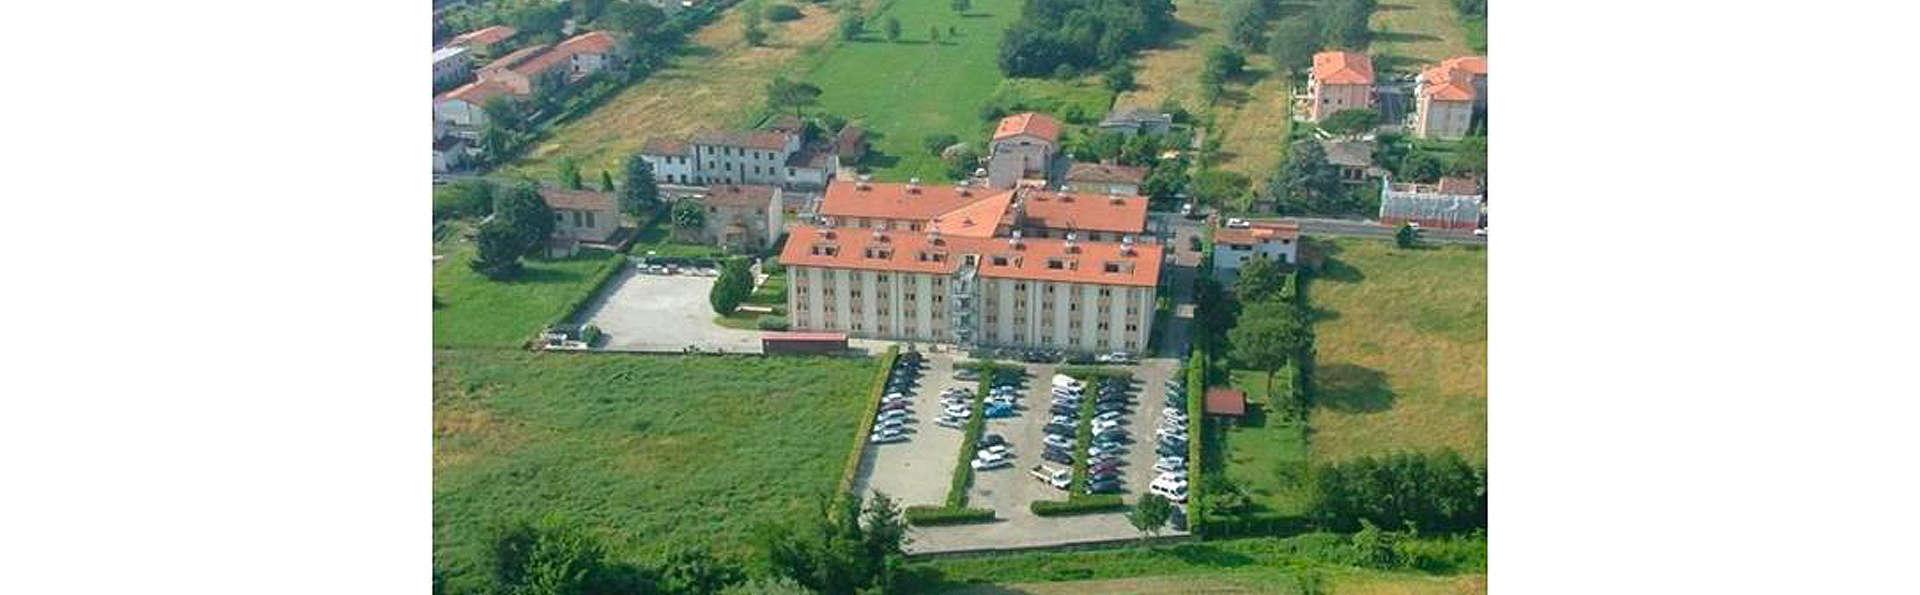 Best Western Grand Hotel Guinigi - EDIT_AERIAL_01.jpg